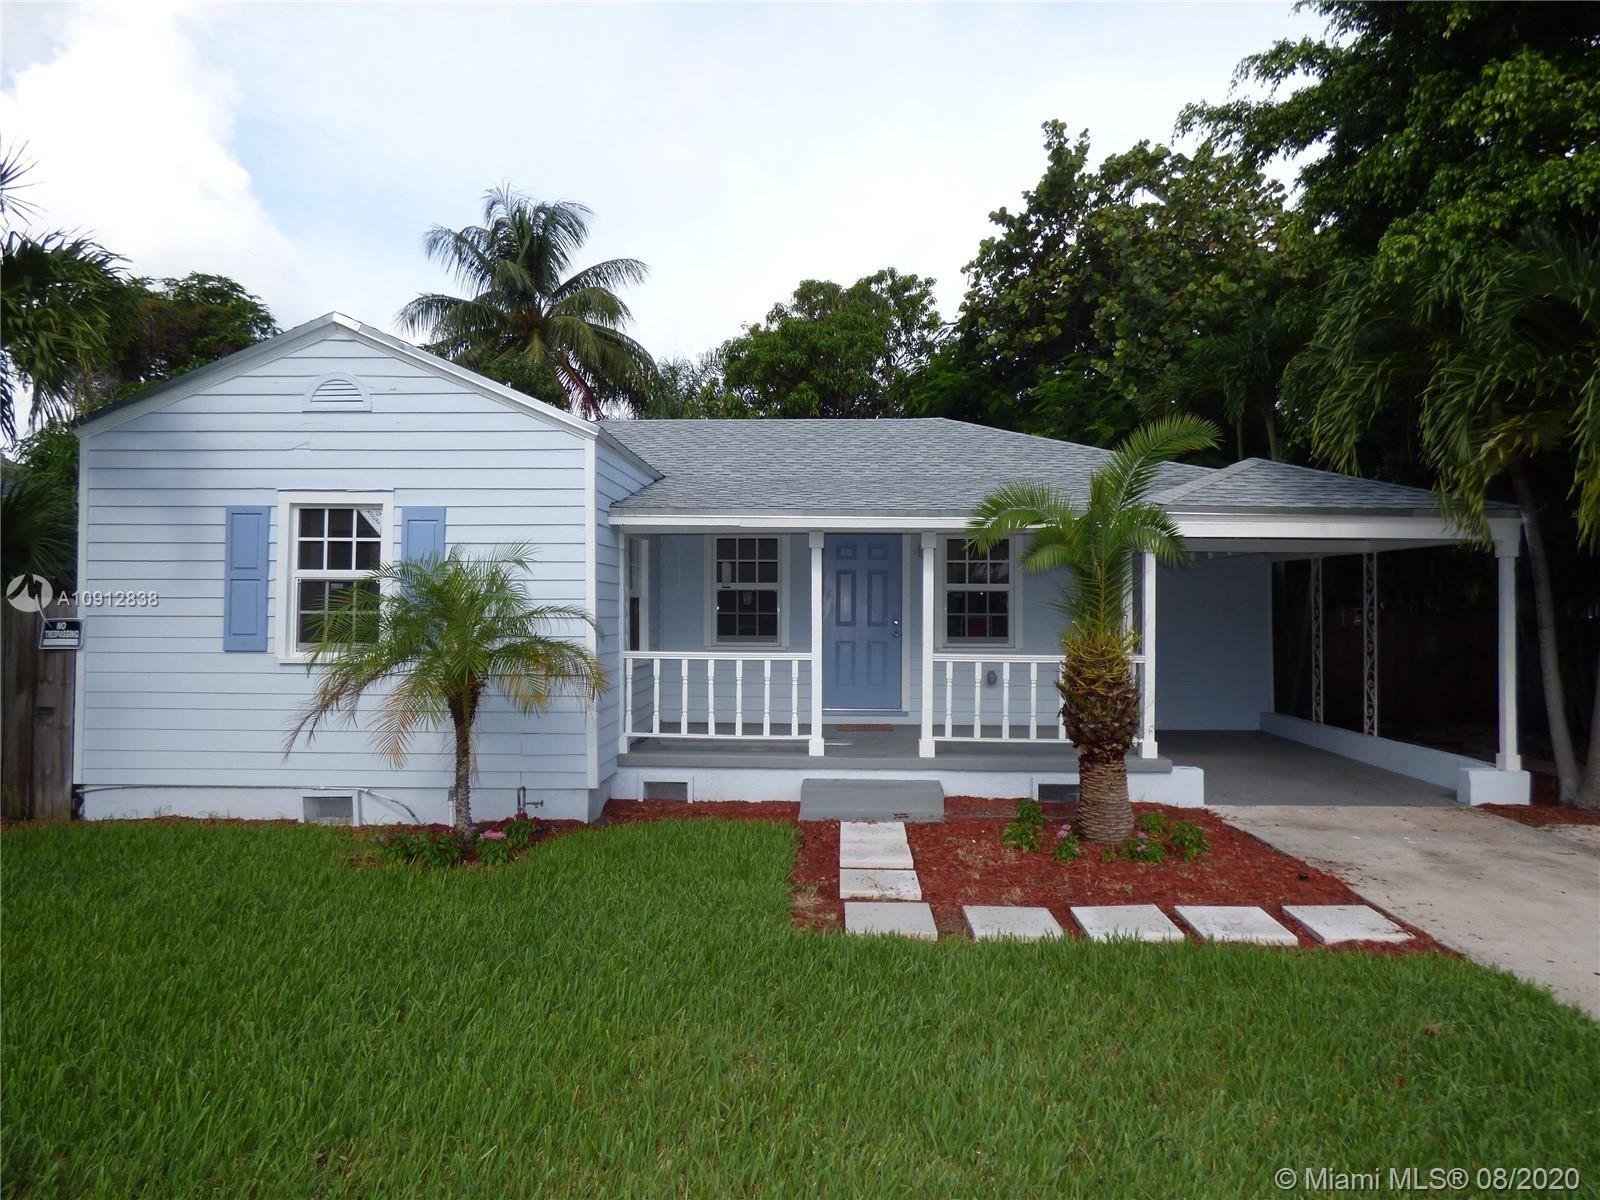 3709 N Flagler Dr, West Palm Beach, FL 33407 - #: A10912838